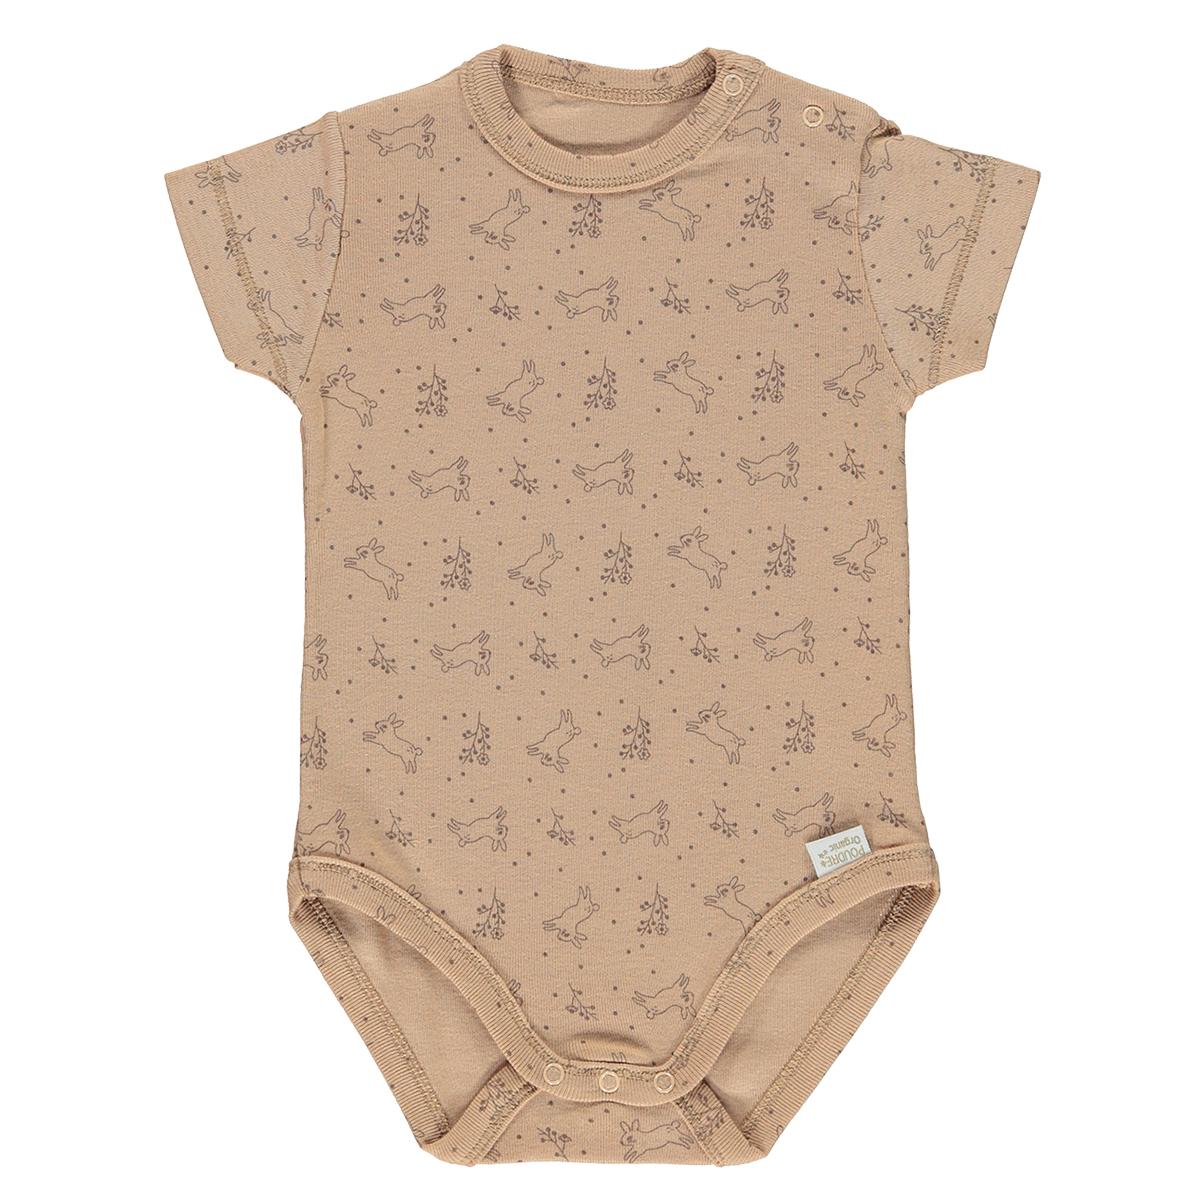 Body & Pyjama Body Manches Courtes Aloes Indian Tan et Motifs - 18 Mois Body Manches Courtes Aloes Indian Tan et Motifs - 18 Mois